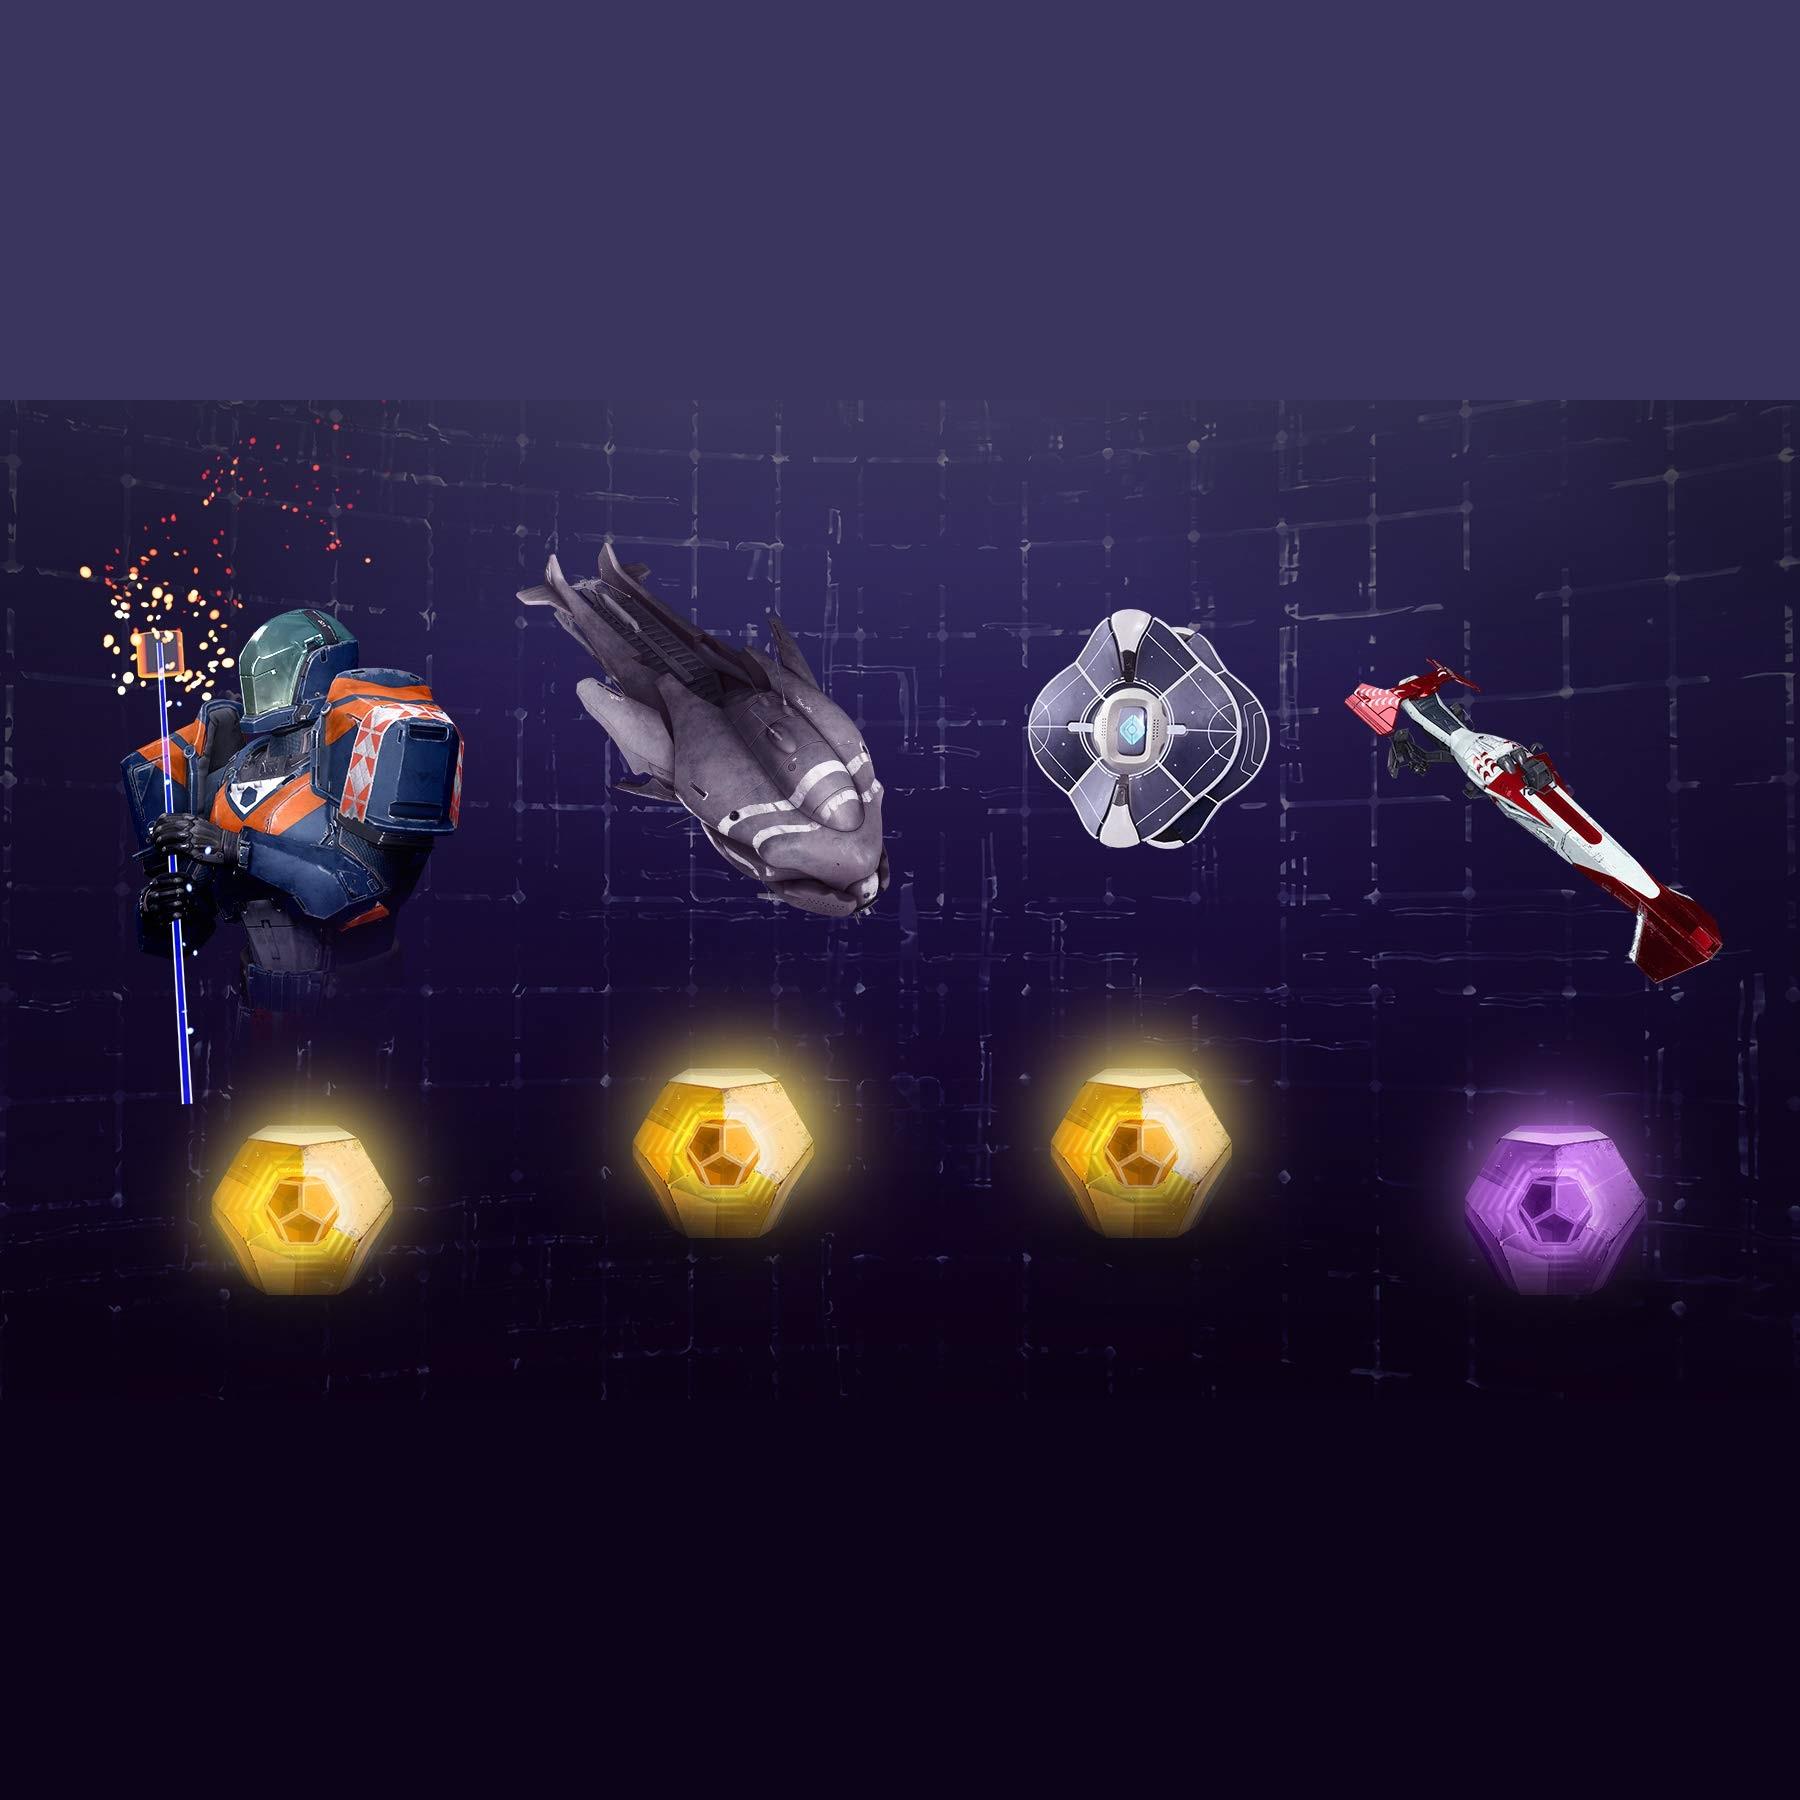 Destiny 2: S'Mores Emote Exotic Bundle inkl. Emote, Geist-Hülle, Vehikel-Skin und Schiff (4/6) | Twitch Prime (PC, PS4, XBOX, Stadia)